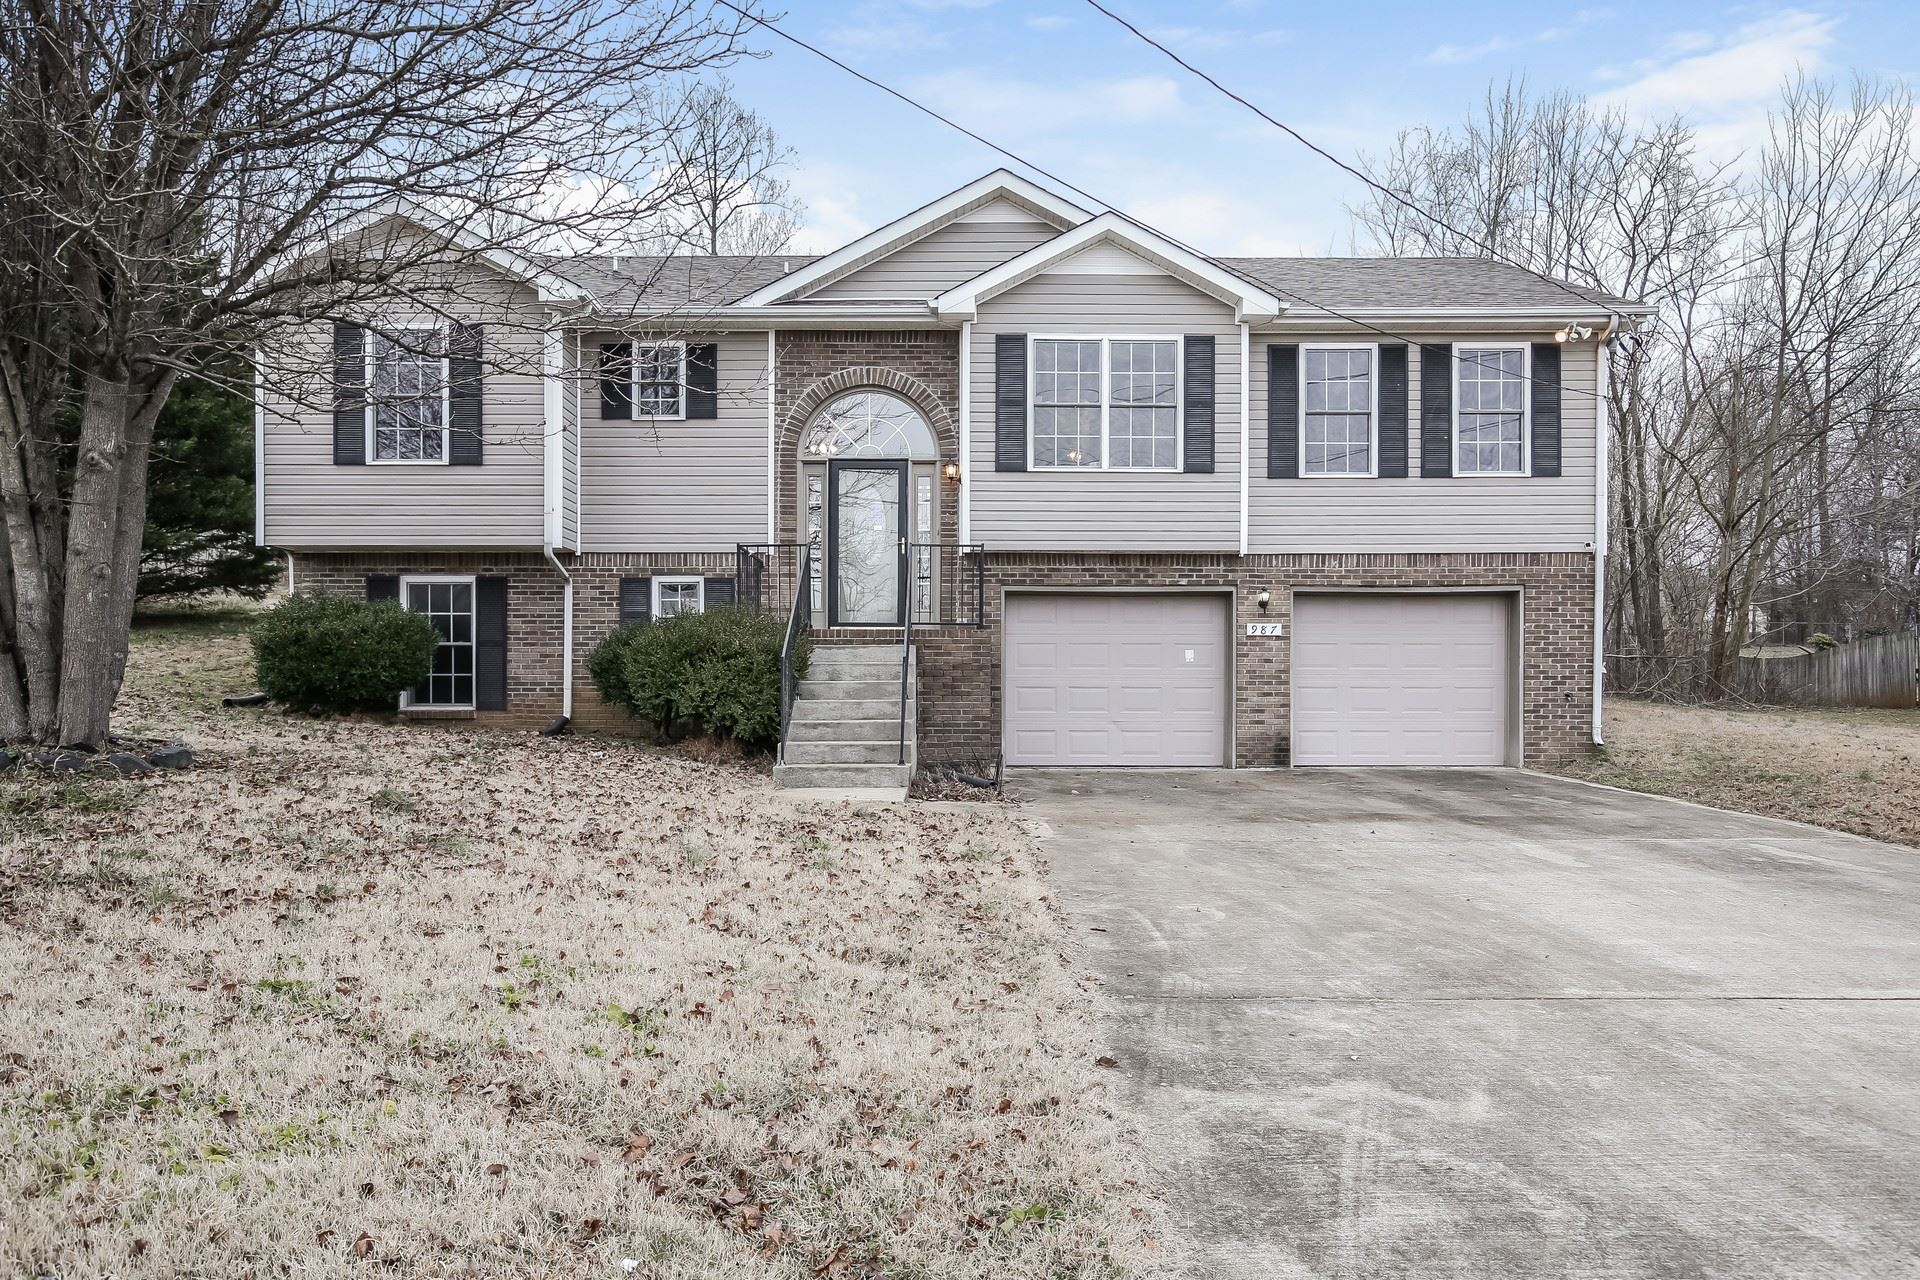 987 Hedge Apple Dr, Clarksville, TN 37040 - MLS#: 2227965